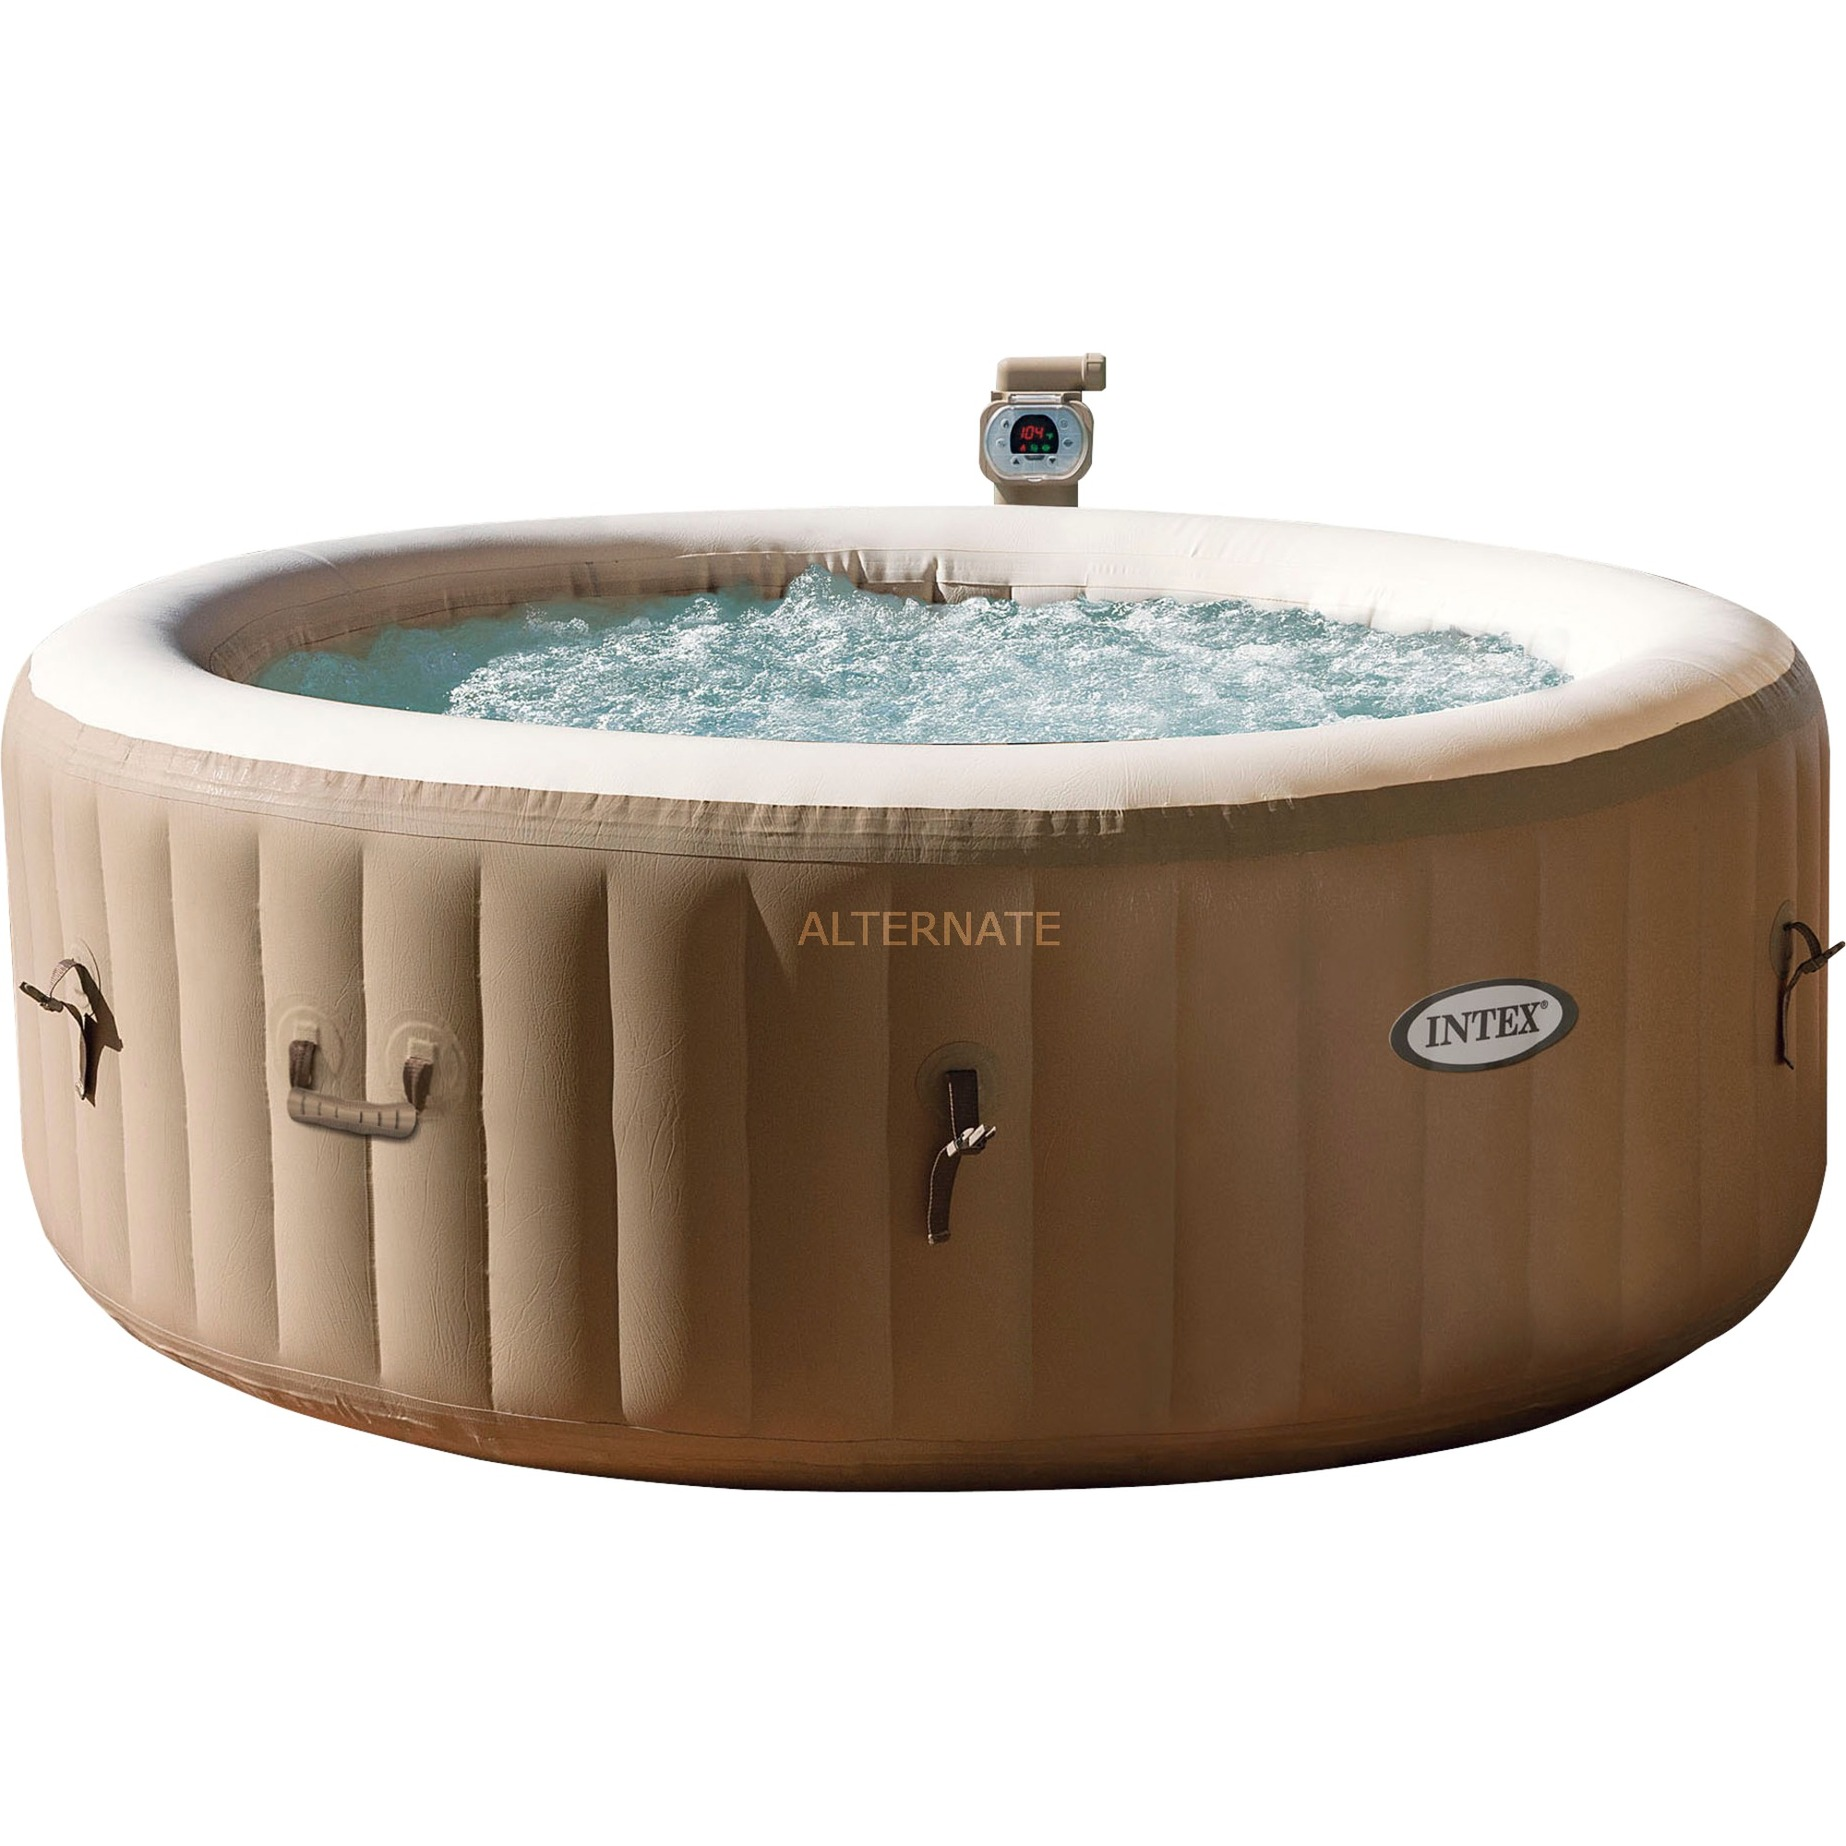 pure-spa-77-swimming-pool